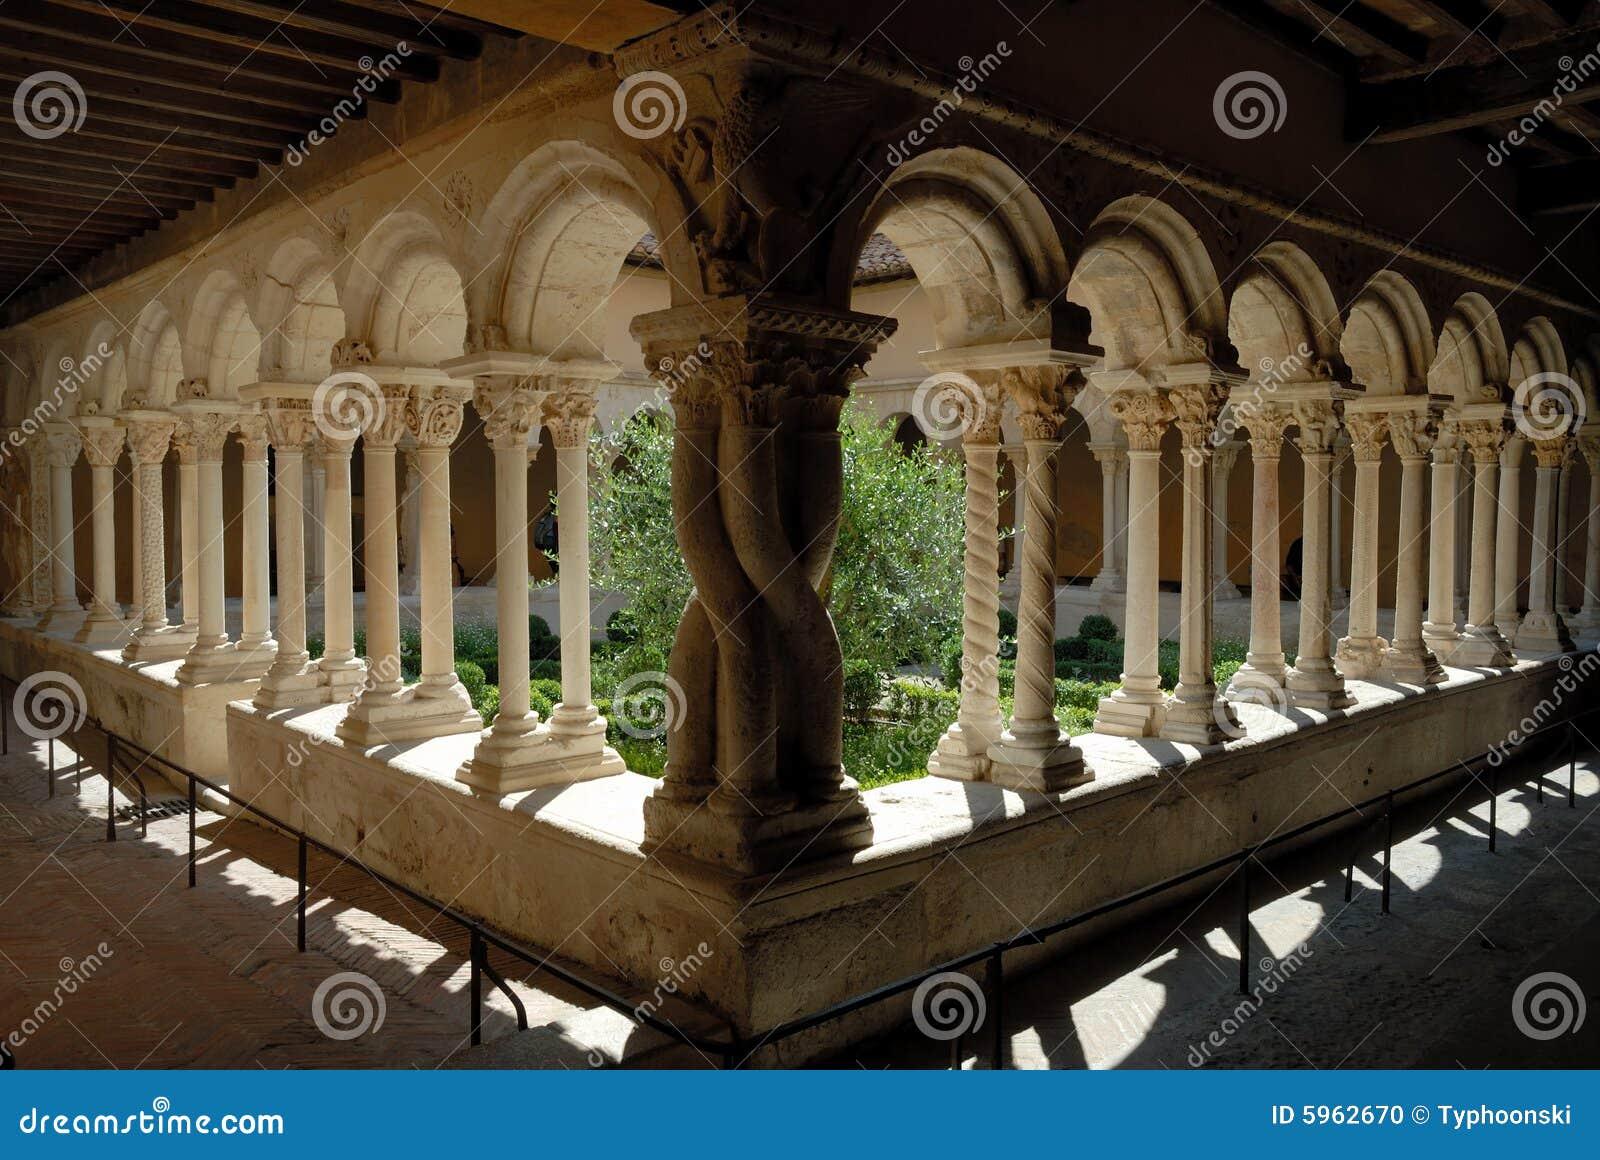 Cloître à Aix-en-Provence, France